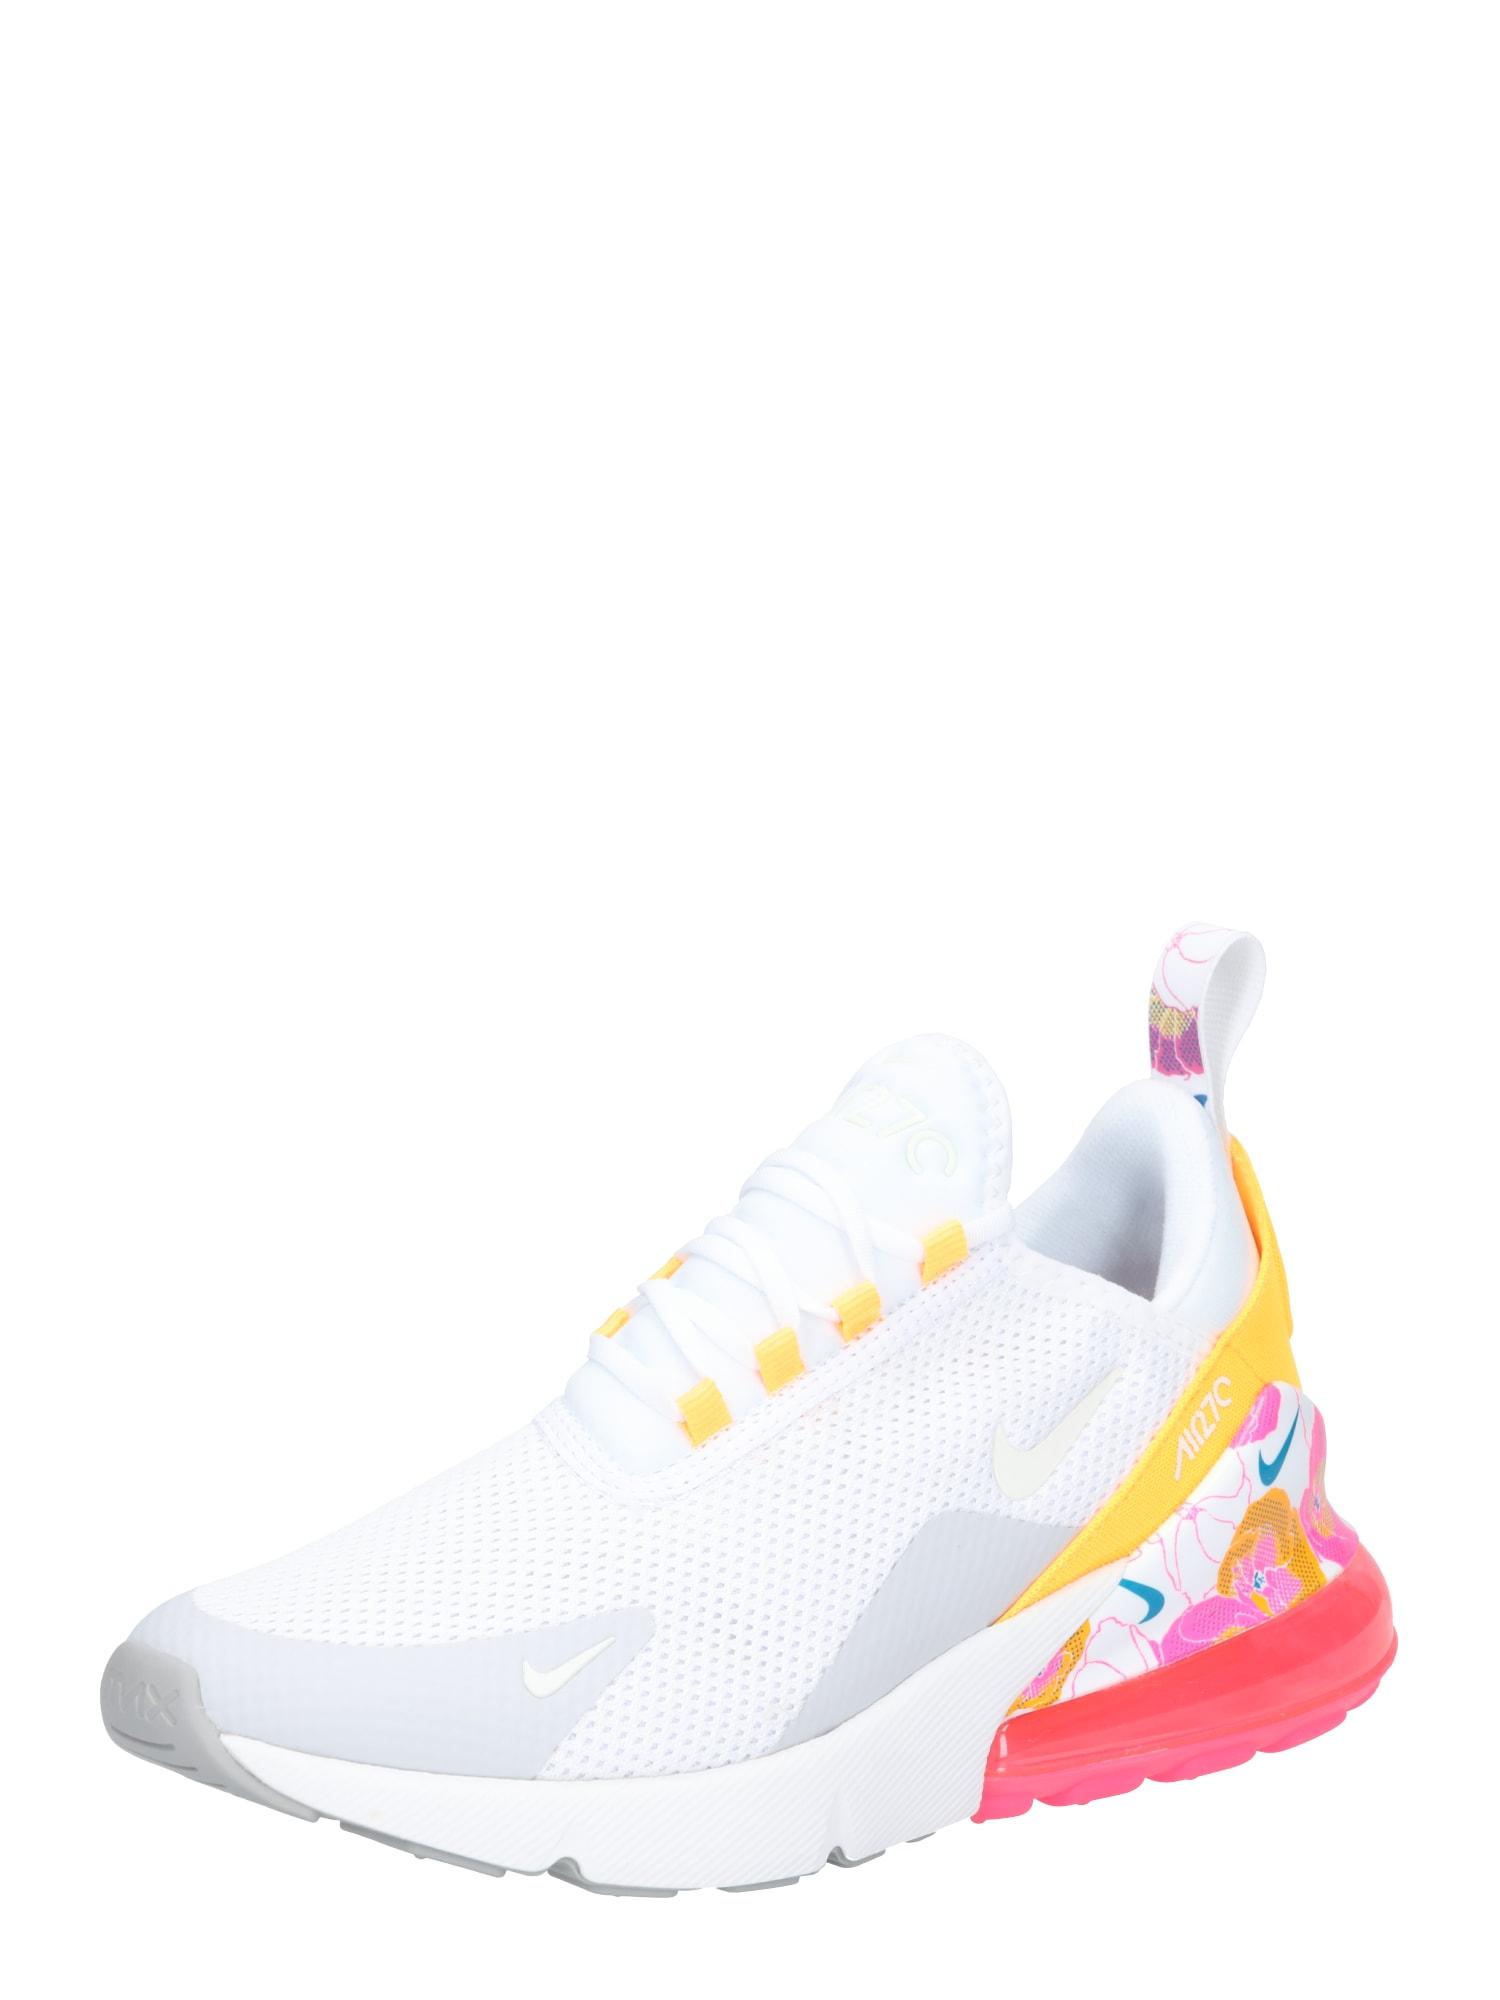 Tenisky Nike Air Max 270 SE stříbrně šedá pink bílá Nike Sportswear